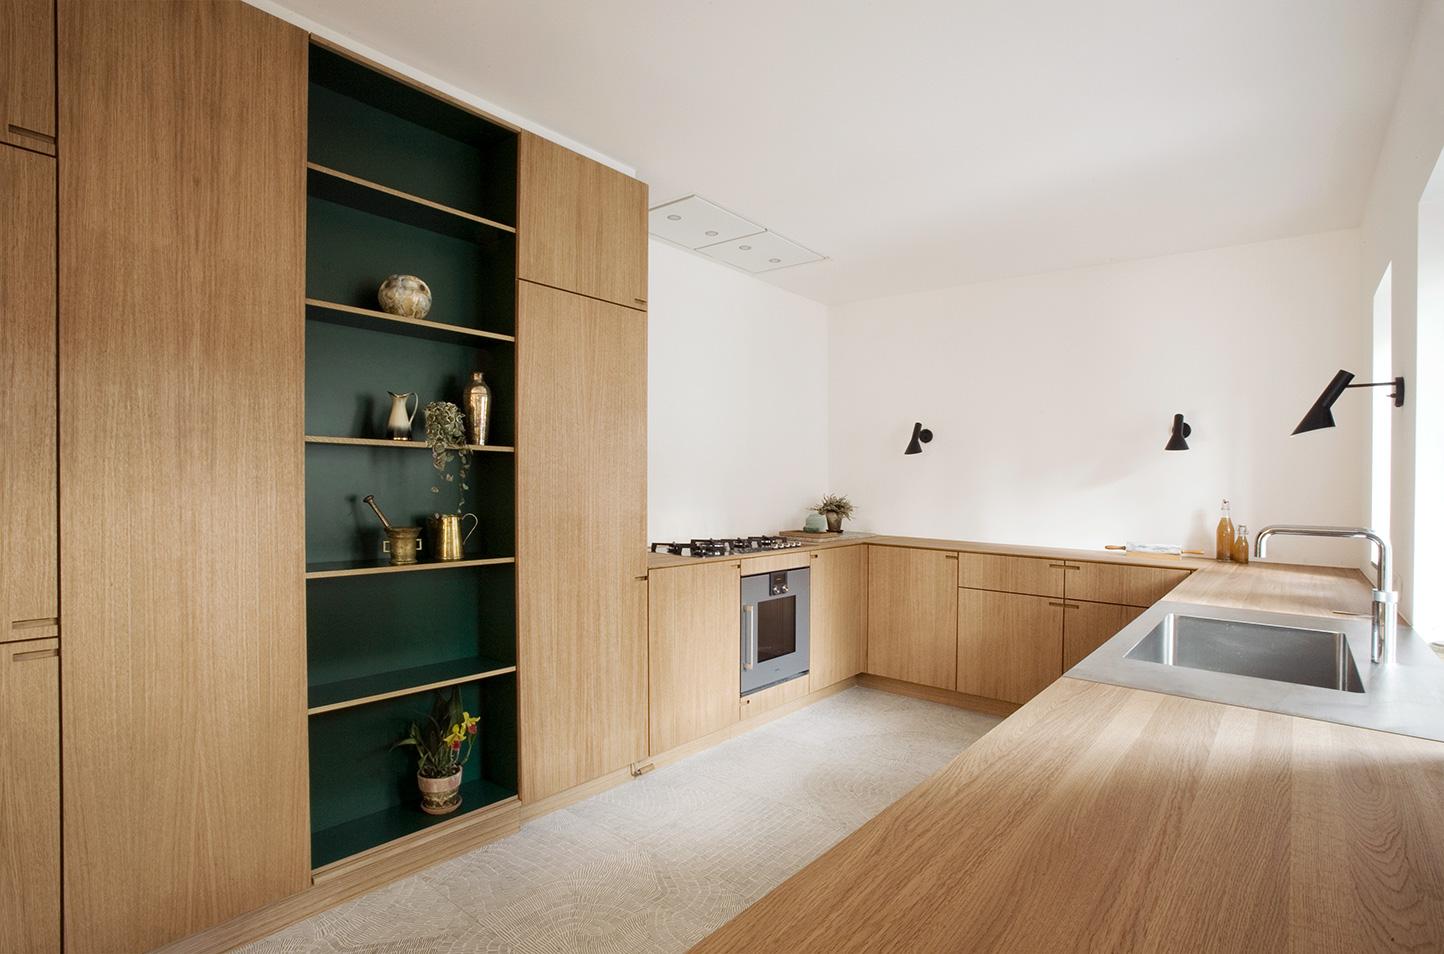 Oak wood kitchen with racing green laminate - by Nicolaj Bo™